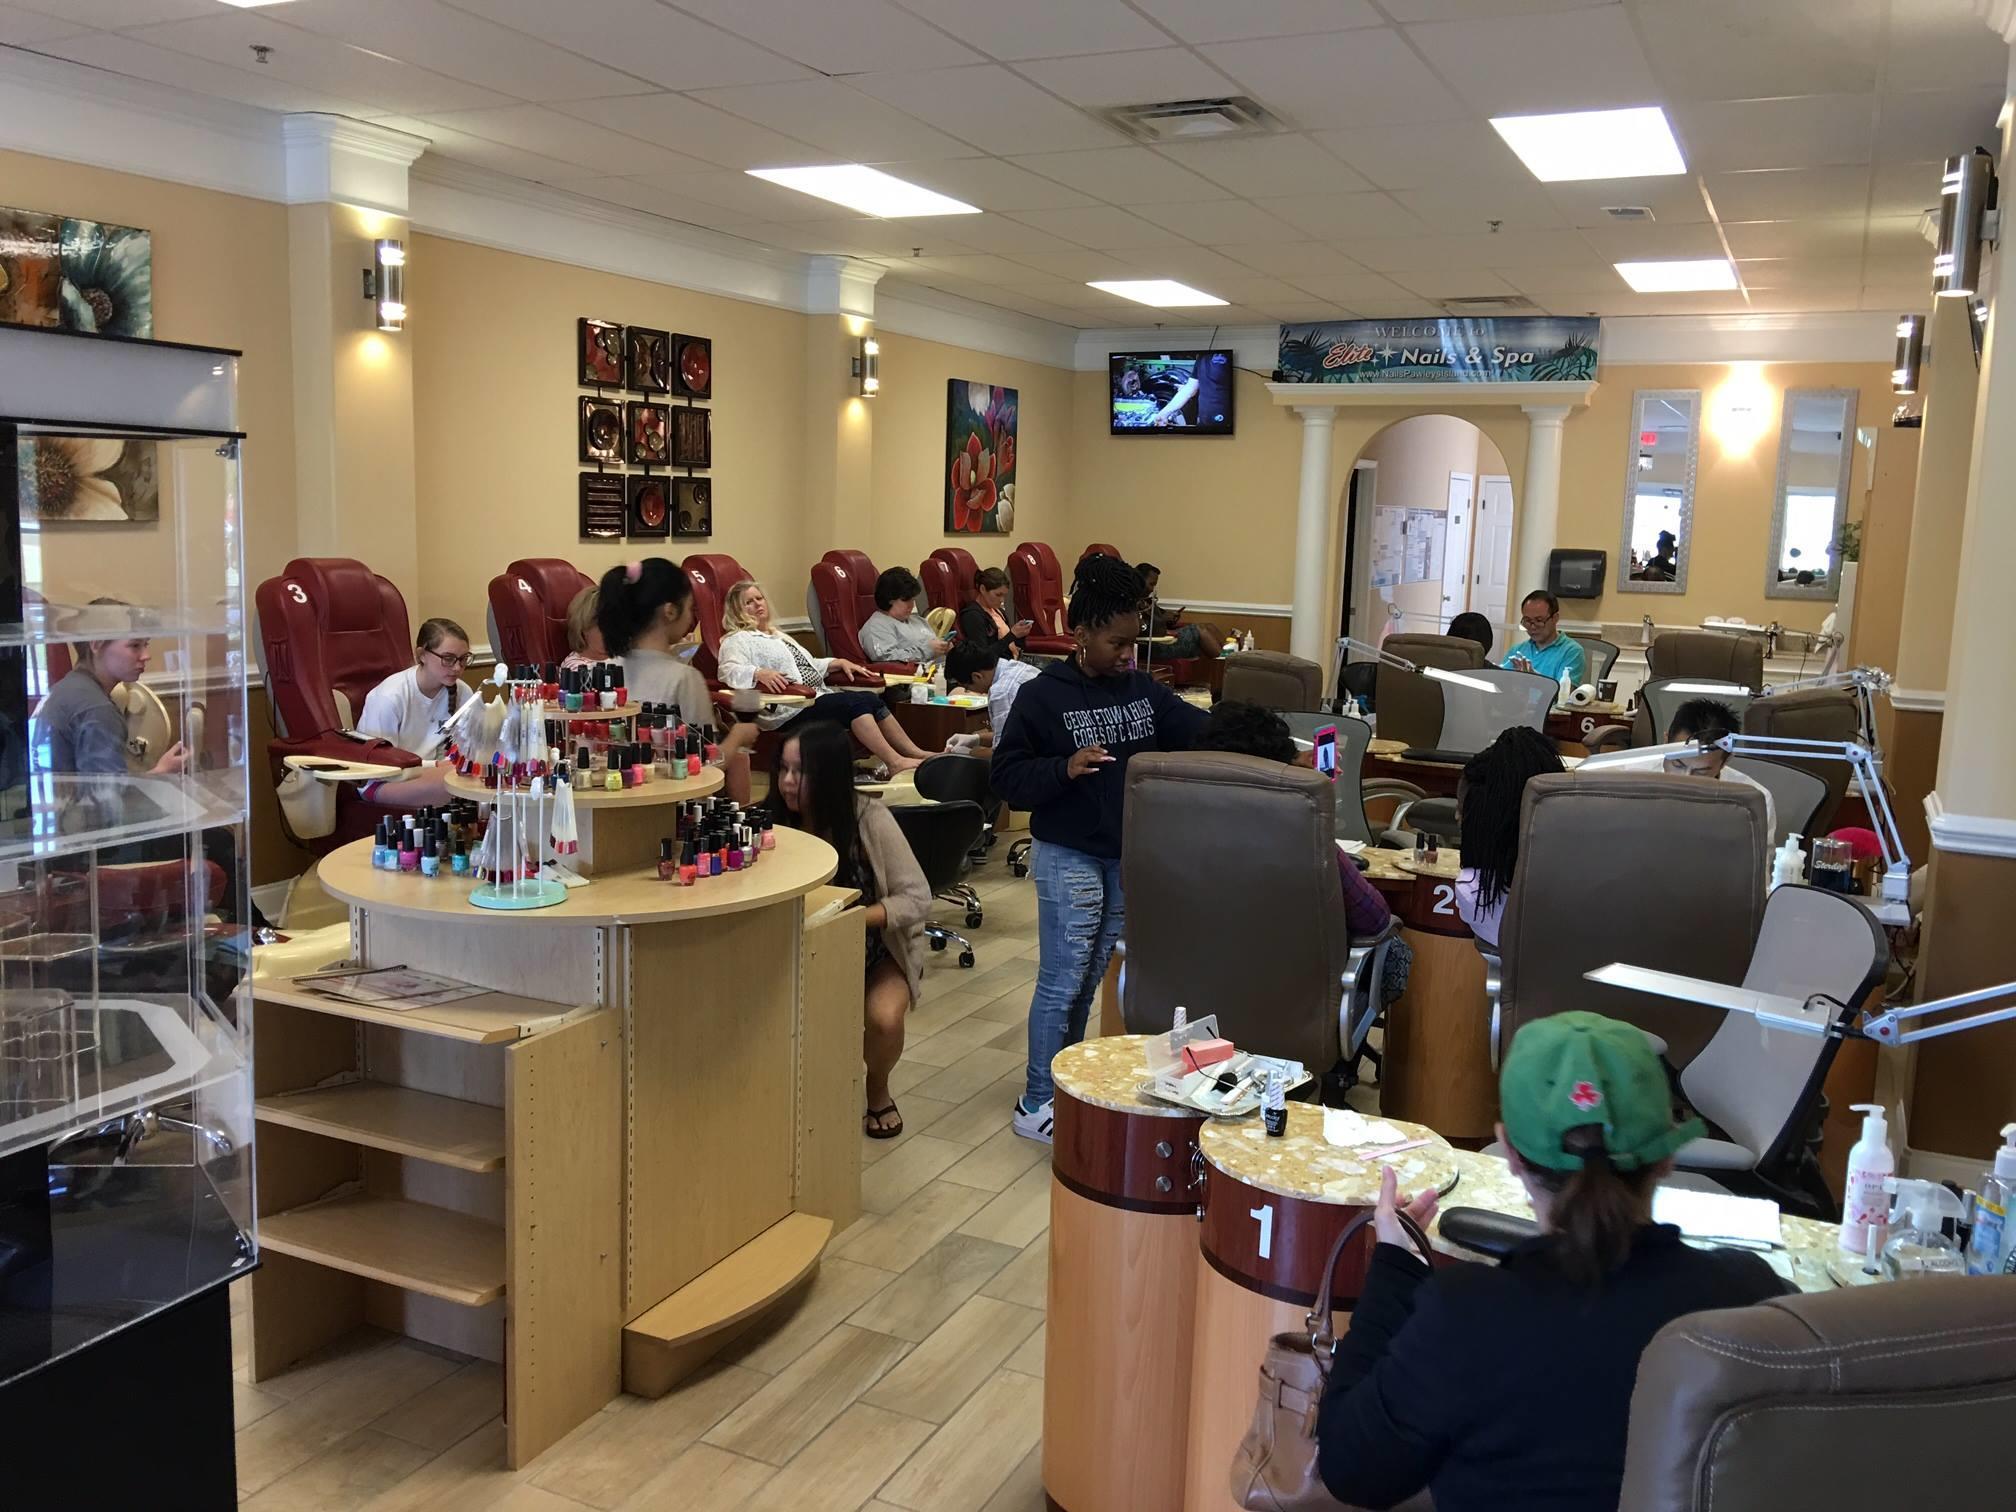 Elite Nails & Spa in Pawleys Island, SC 29585 - ChamberofCommerce.com